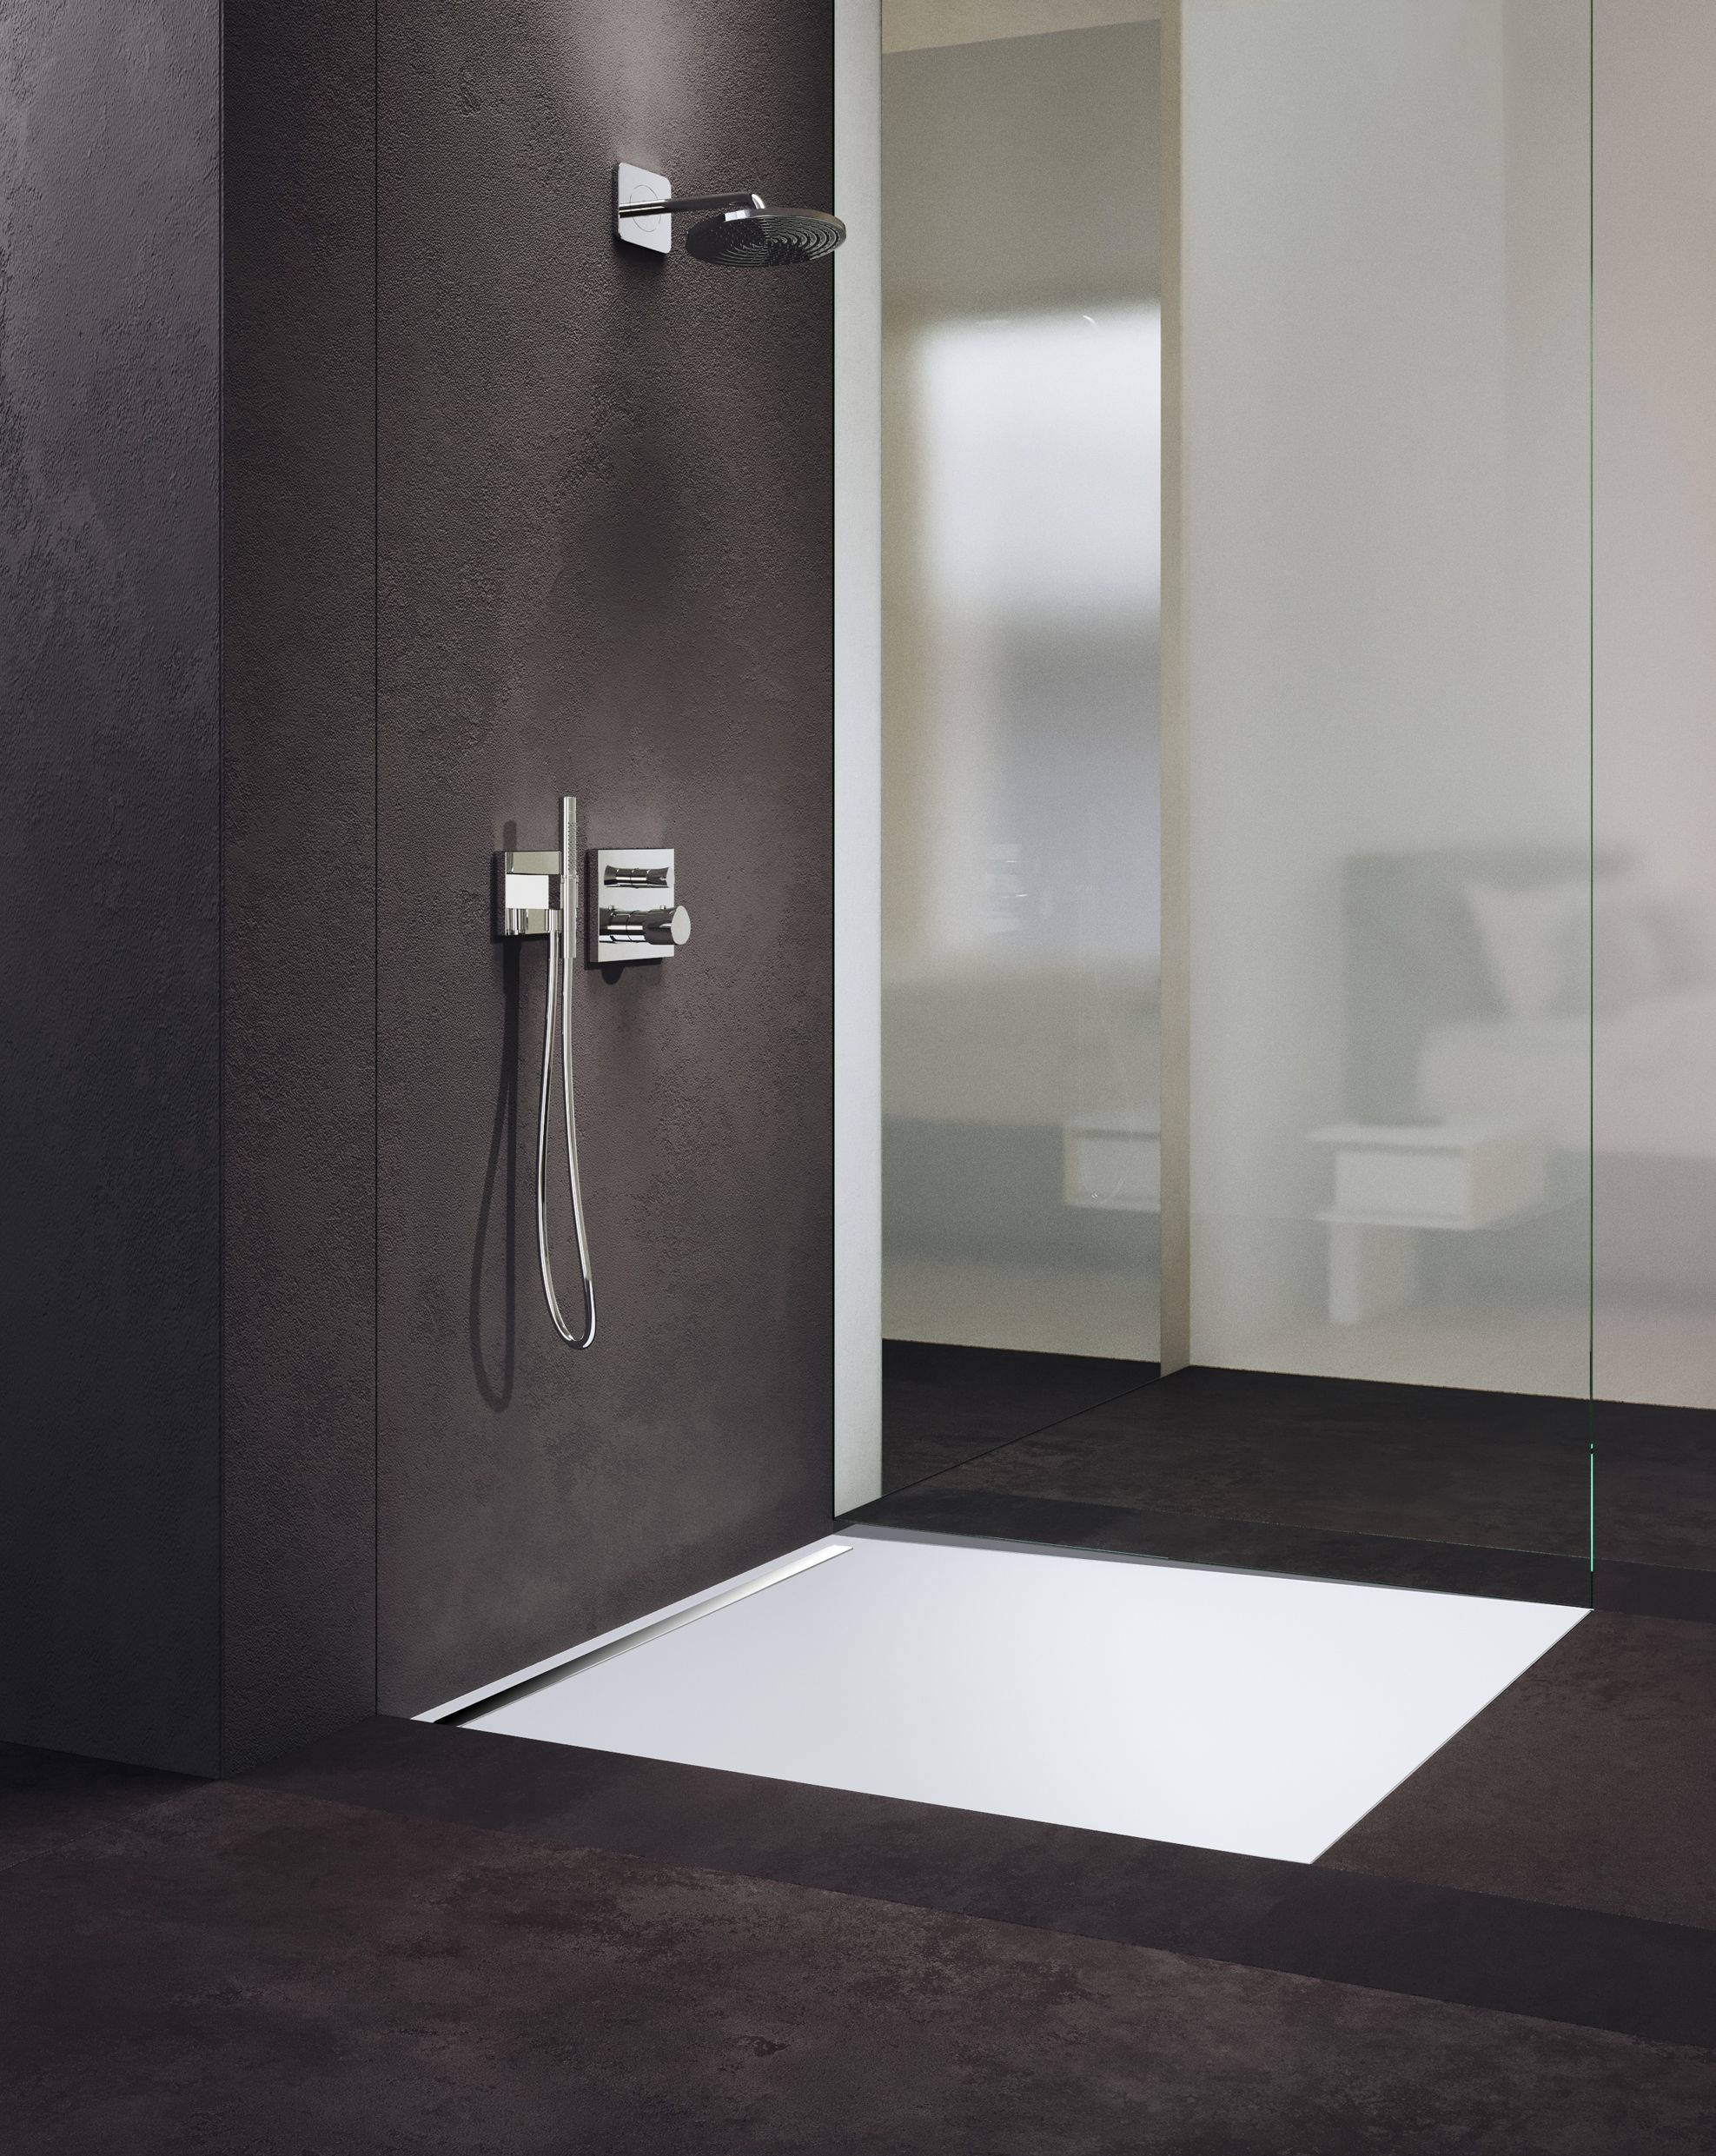 Kaldewei NexSys is an innovative 4in1 showerfloor